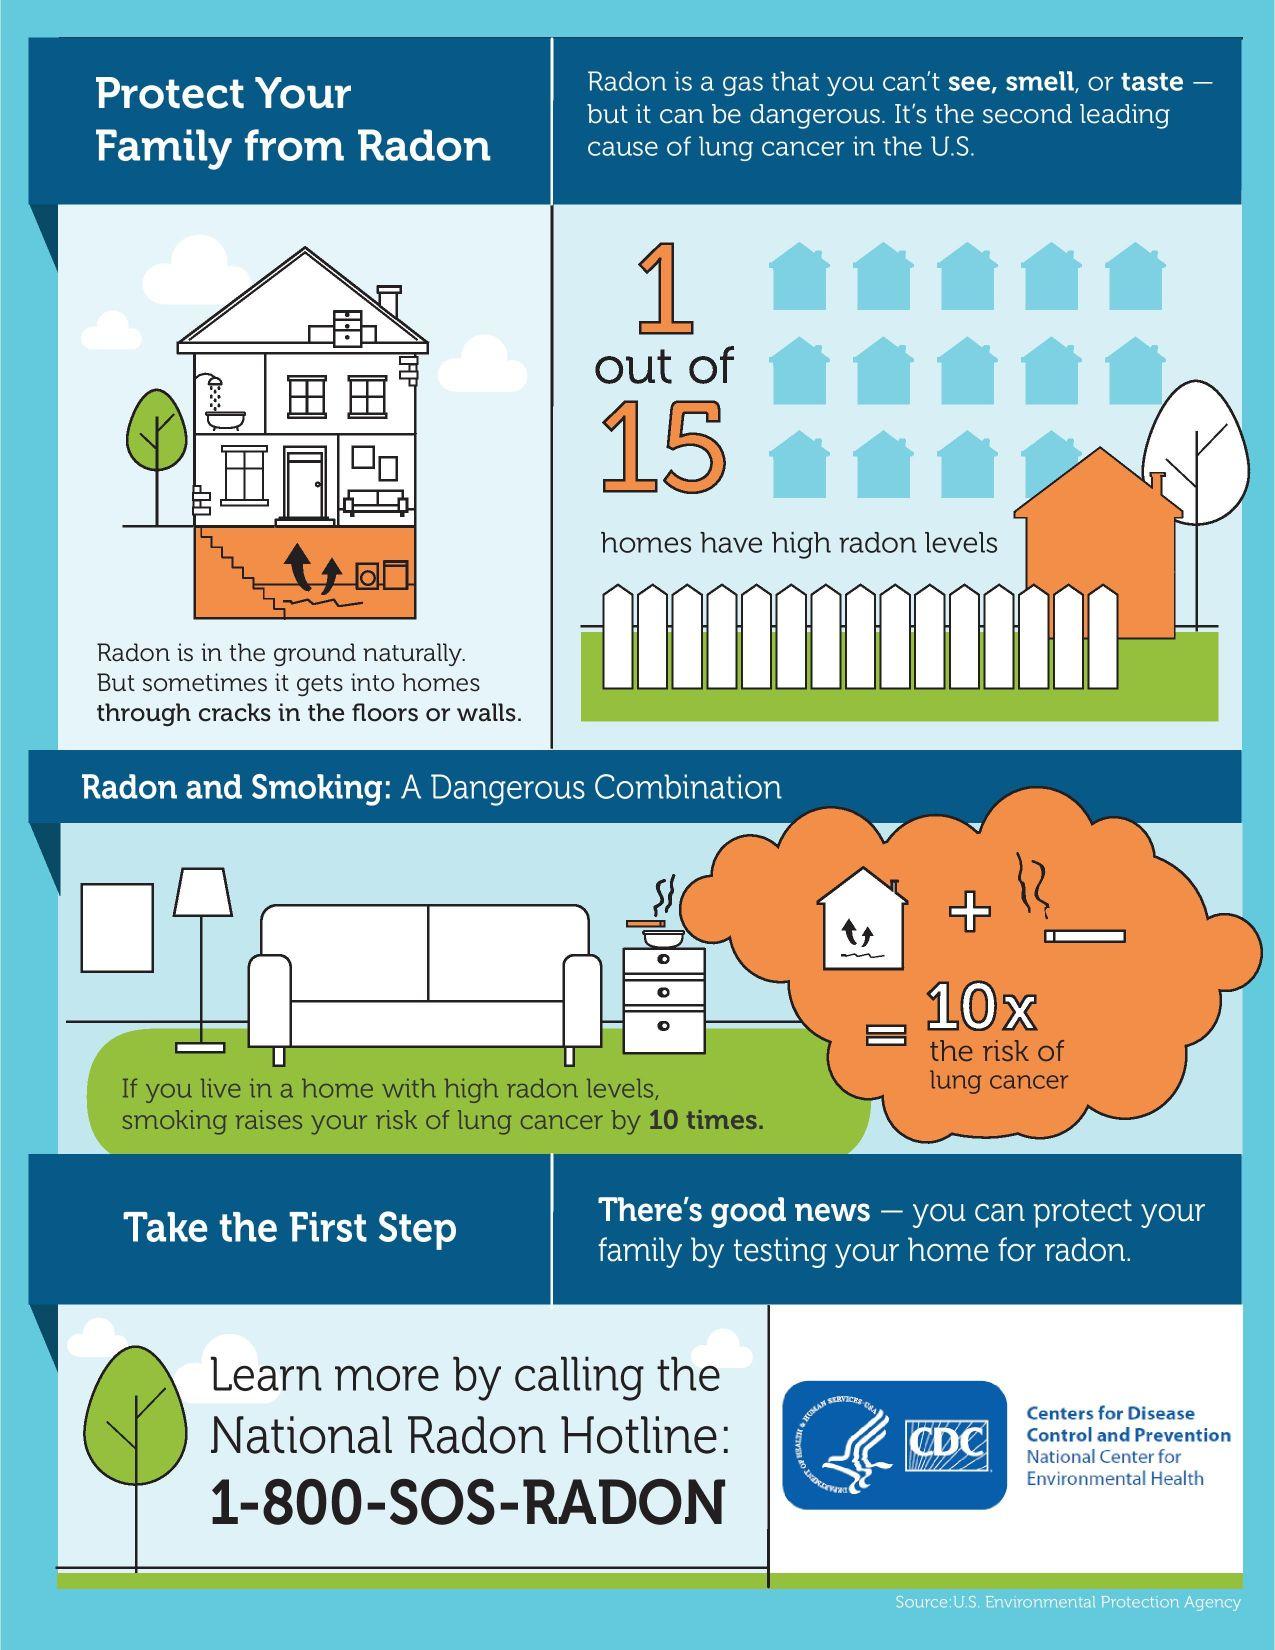 radon_infographic-page-001 (2).jpg